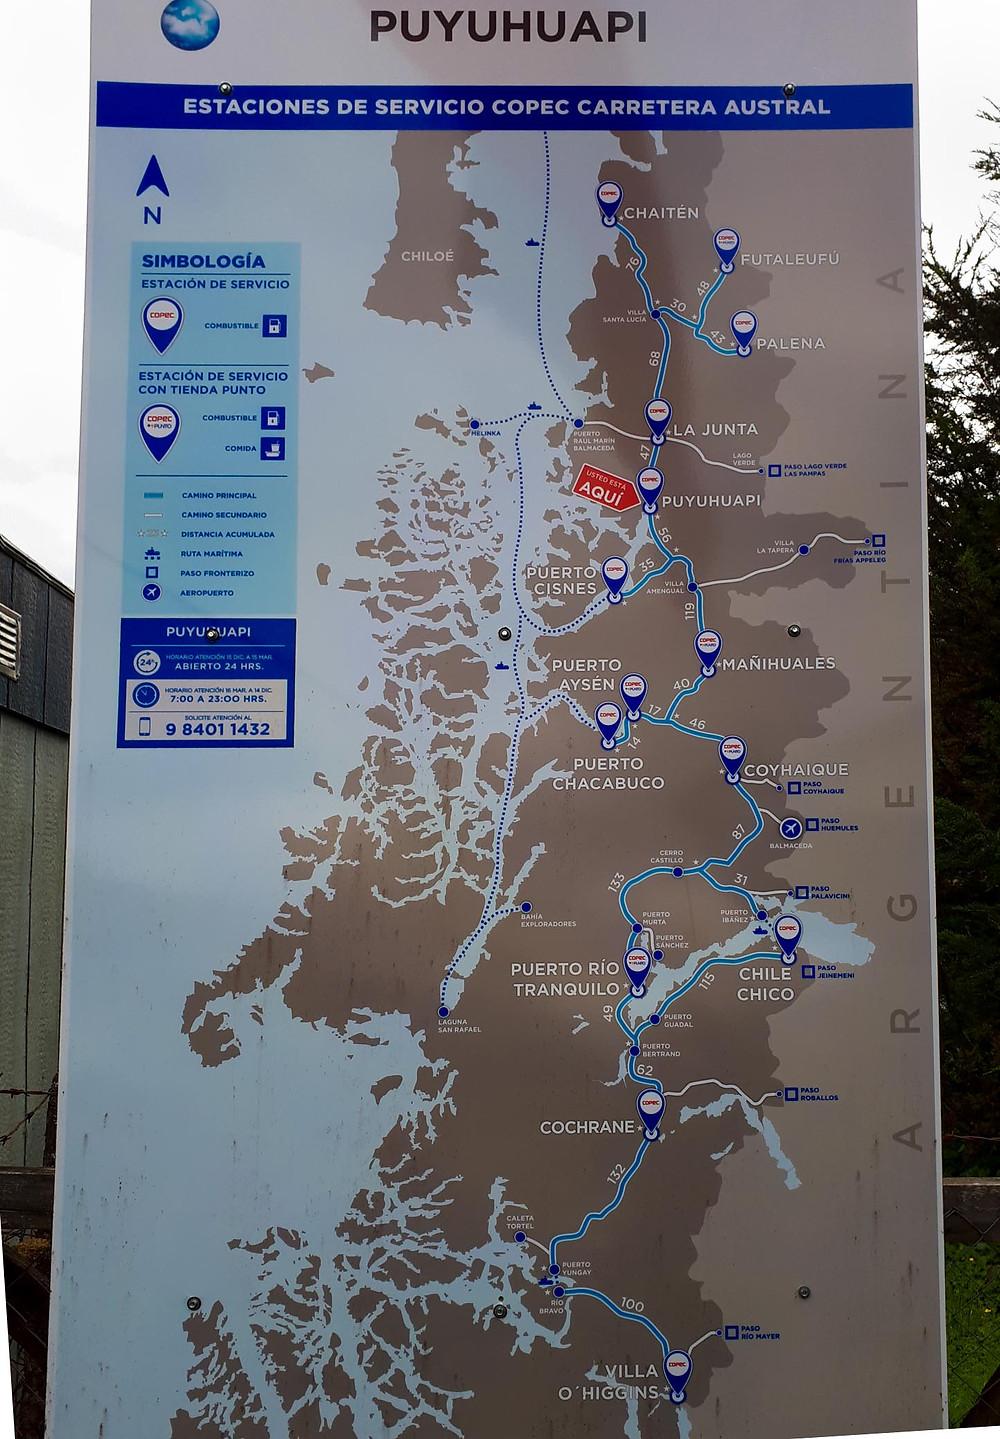 Puyuhuapi Copec Station Map; reassuring us of fuel availability on route! - AvVida.co.uk